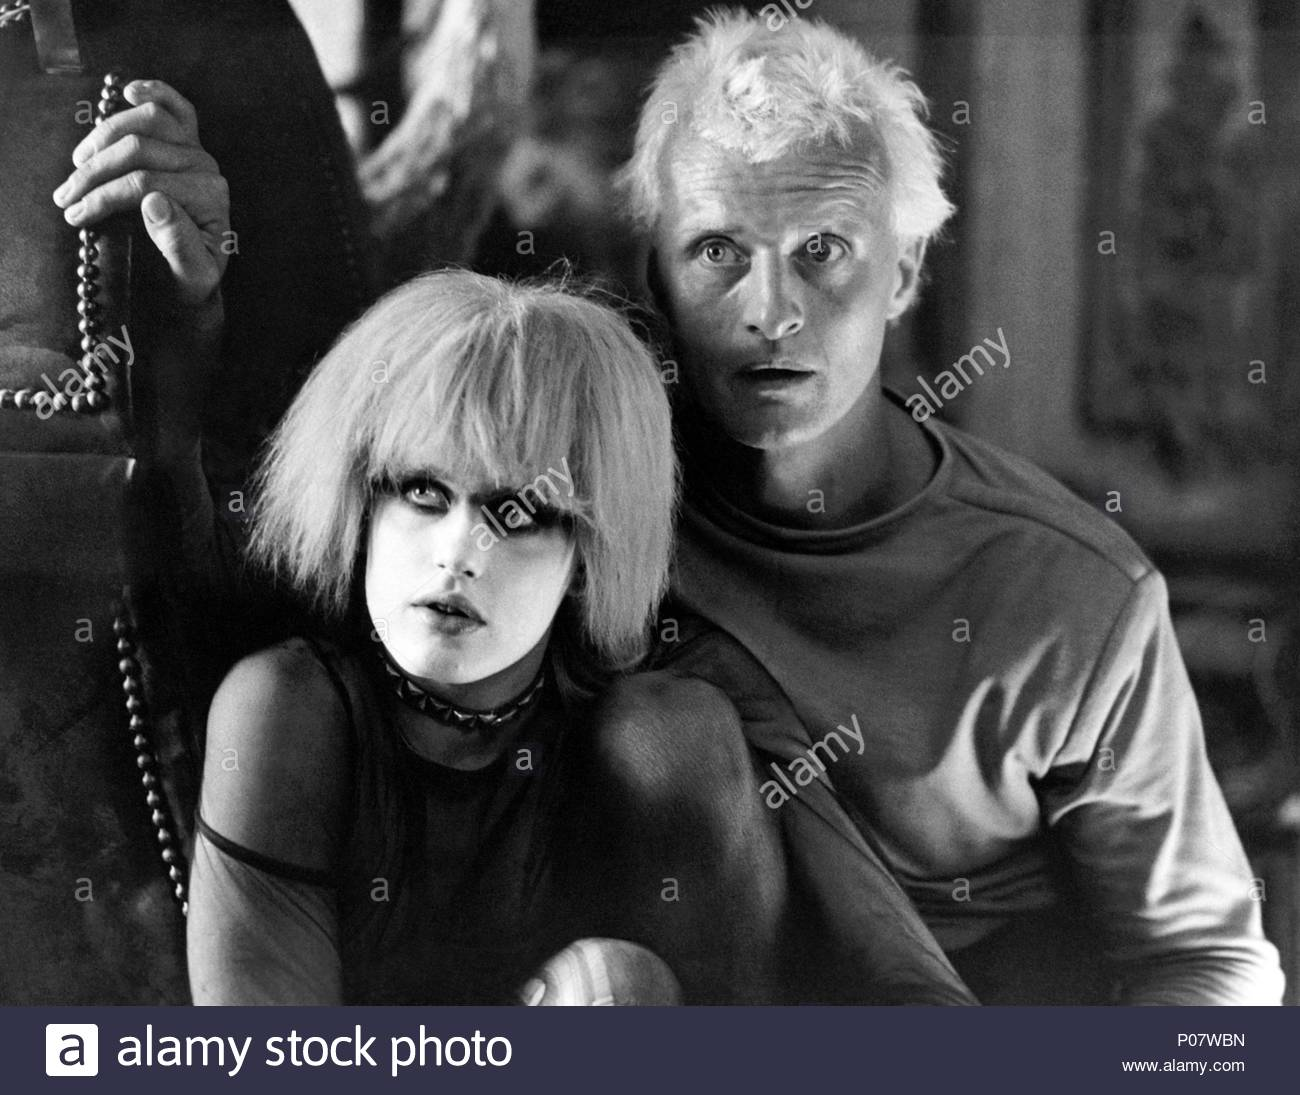 Original Film Title: BLADE RUNNER.  English Title: BLADE RUNNER.  Film Director: RIDLEY SCOTT.  Year: 1982.  Stars: DARYL HANNAH; RUTGER HAUER. Credit: LADD COMPANY/WARNER BROS / Album - Stock Image